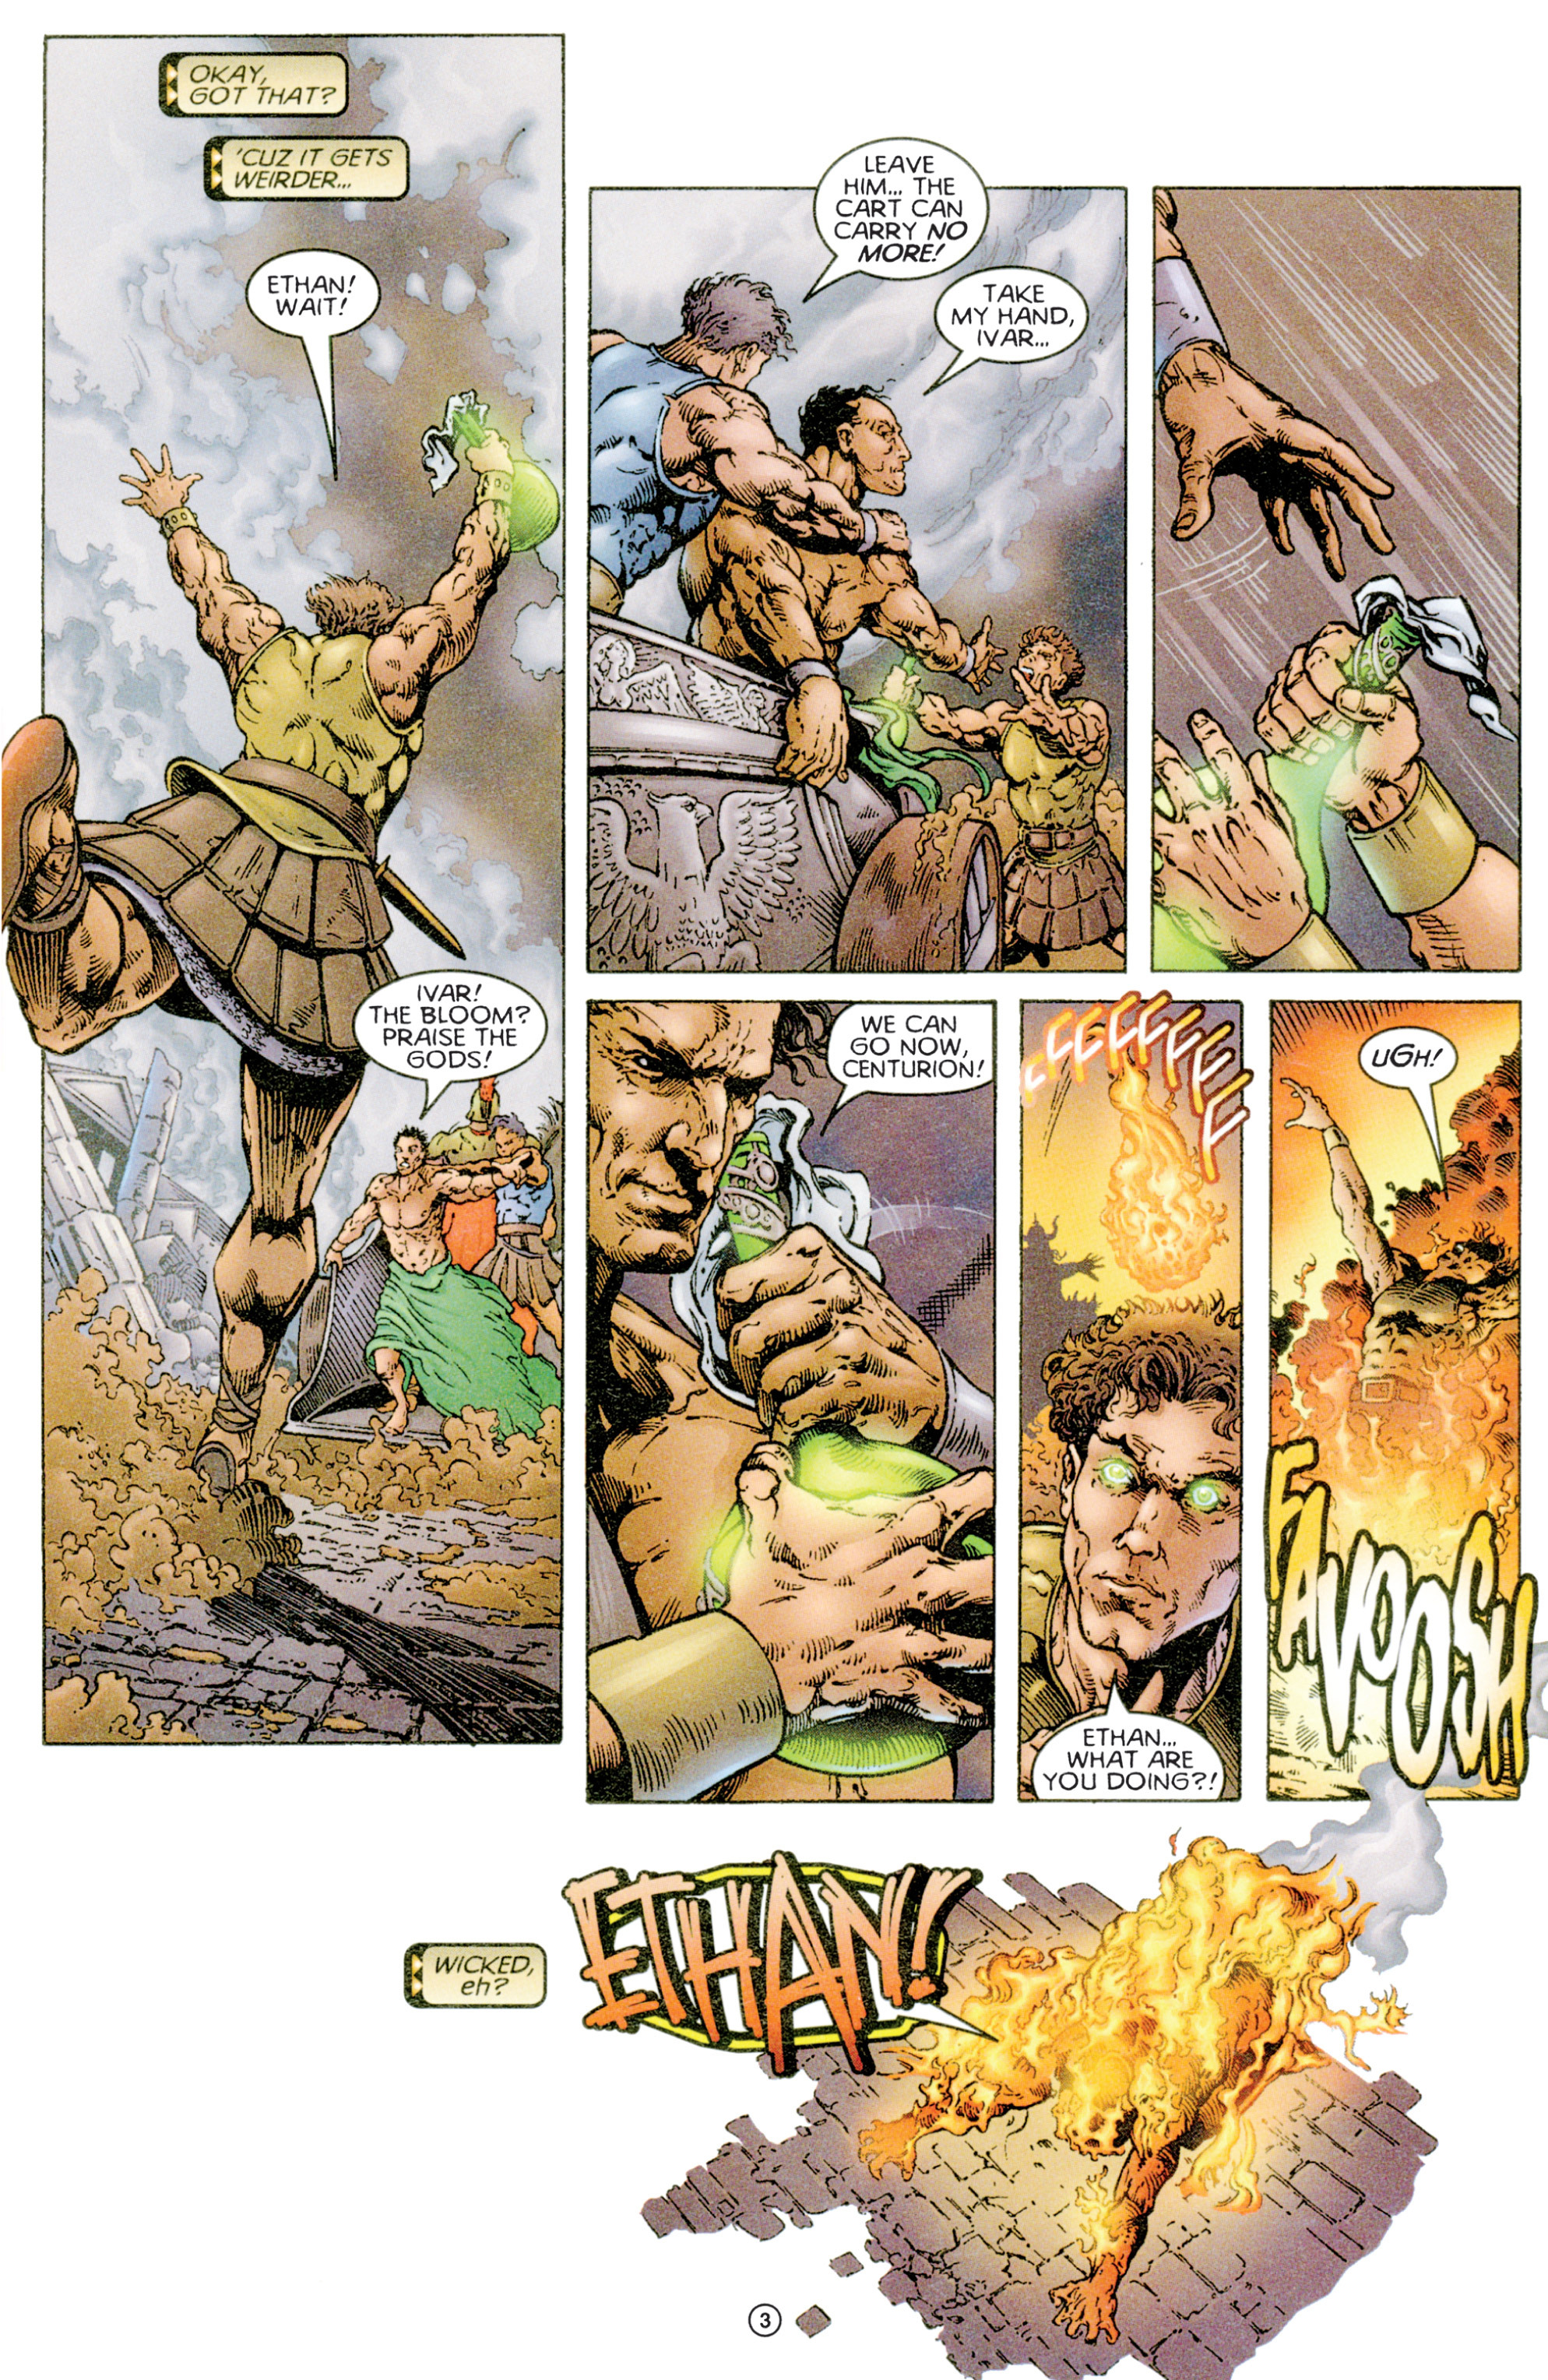 Read online Eternal Warriors comic -  Issue # Issue Time & Treachery - 4